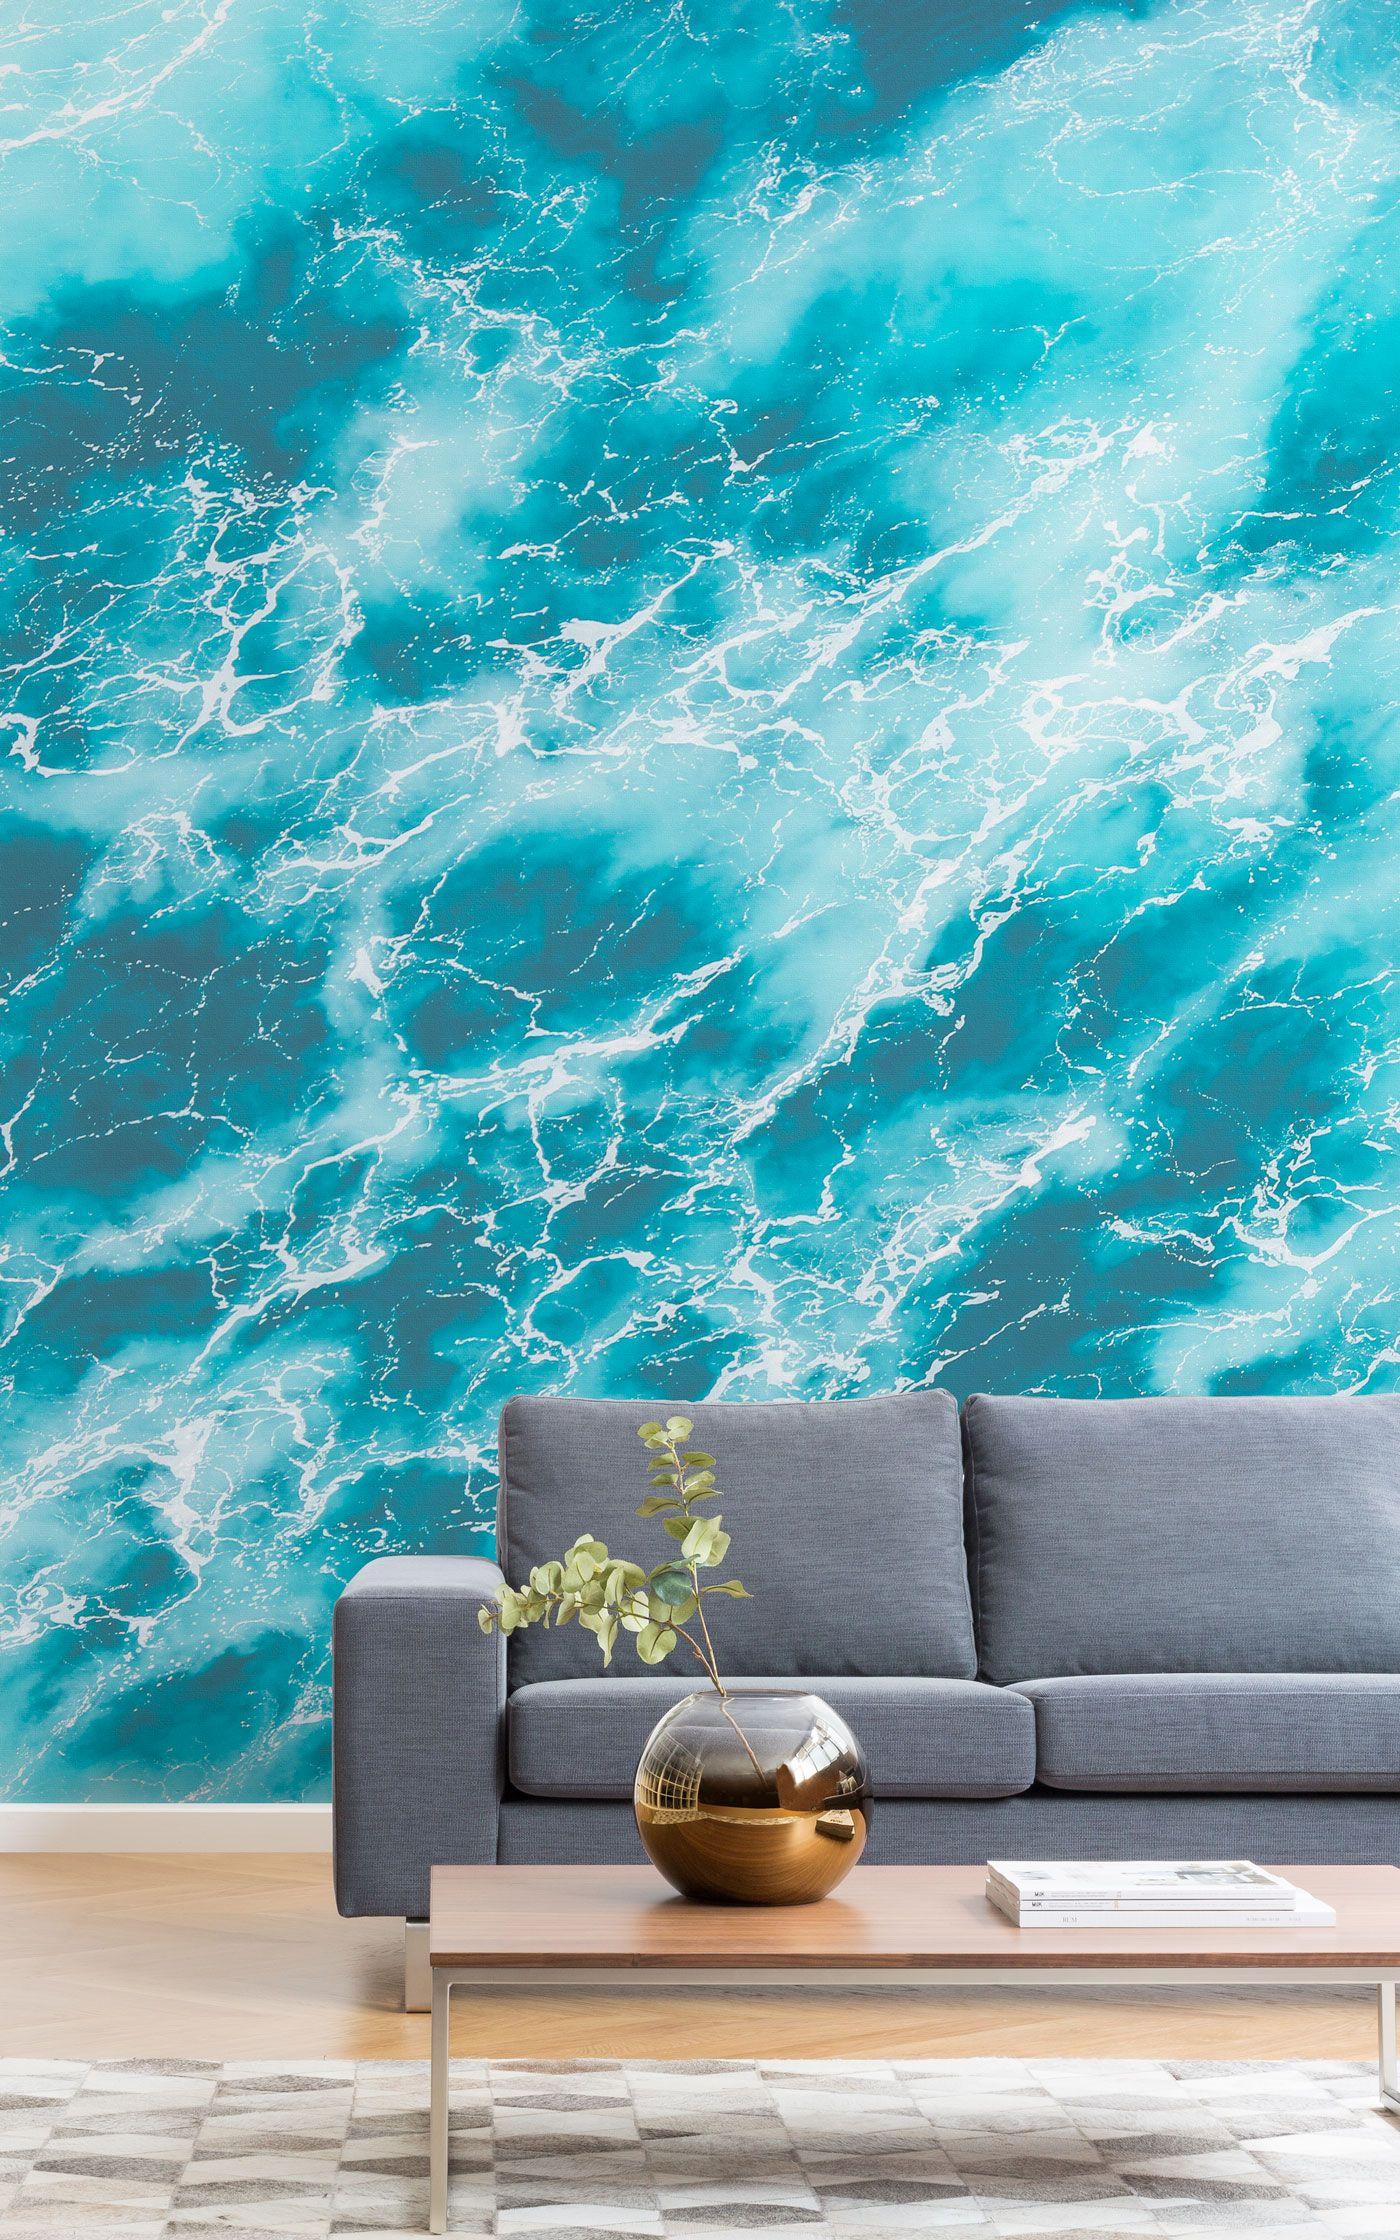 Caspian Photographic Ocean Wallpaper Mural Murals Wallp